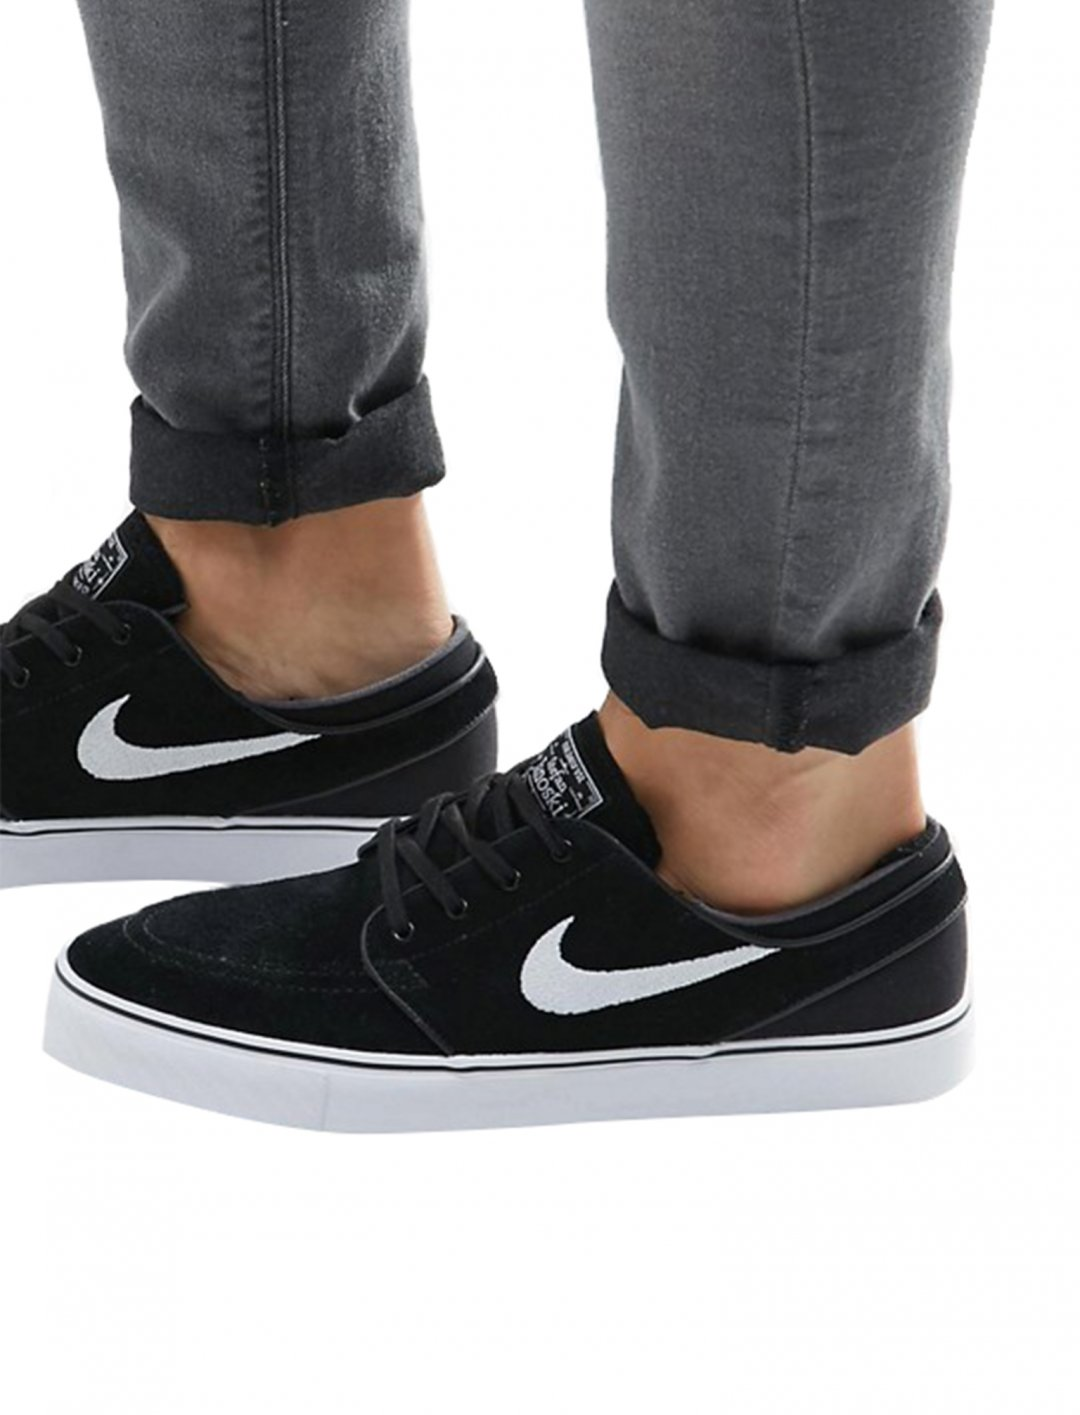 Stefan Janoski Trainers Clothing  Nike